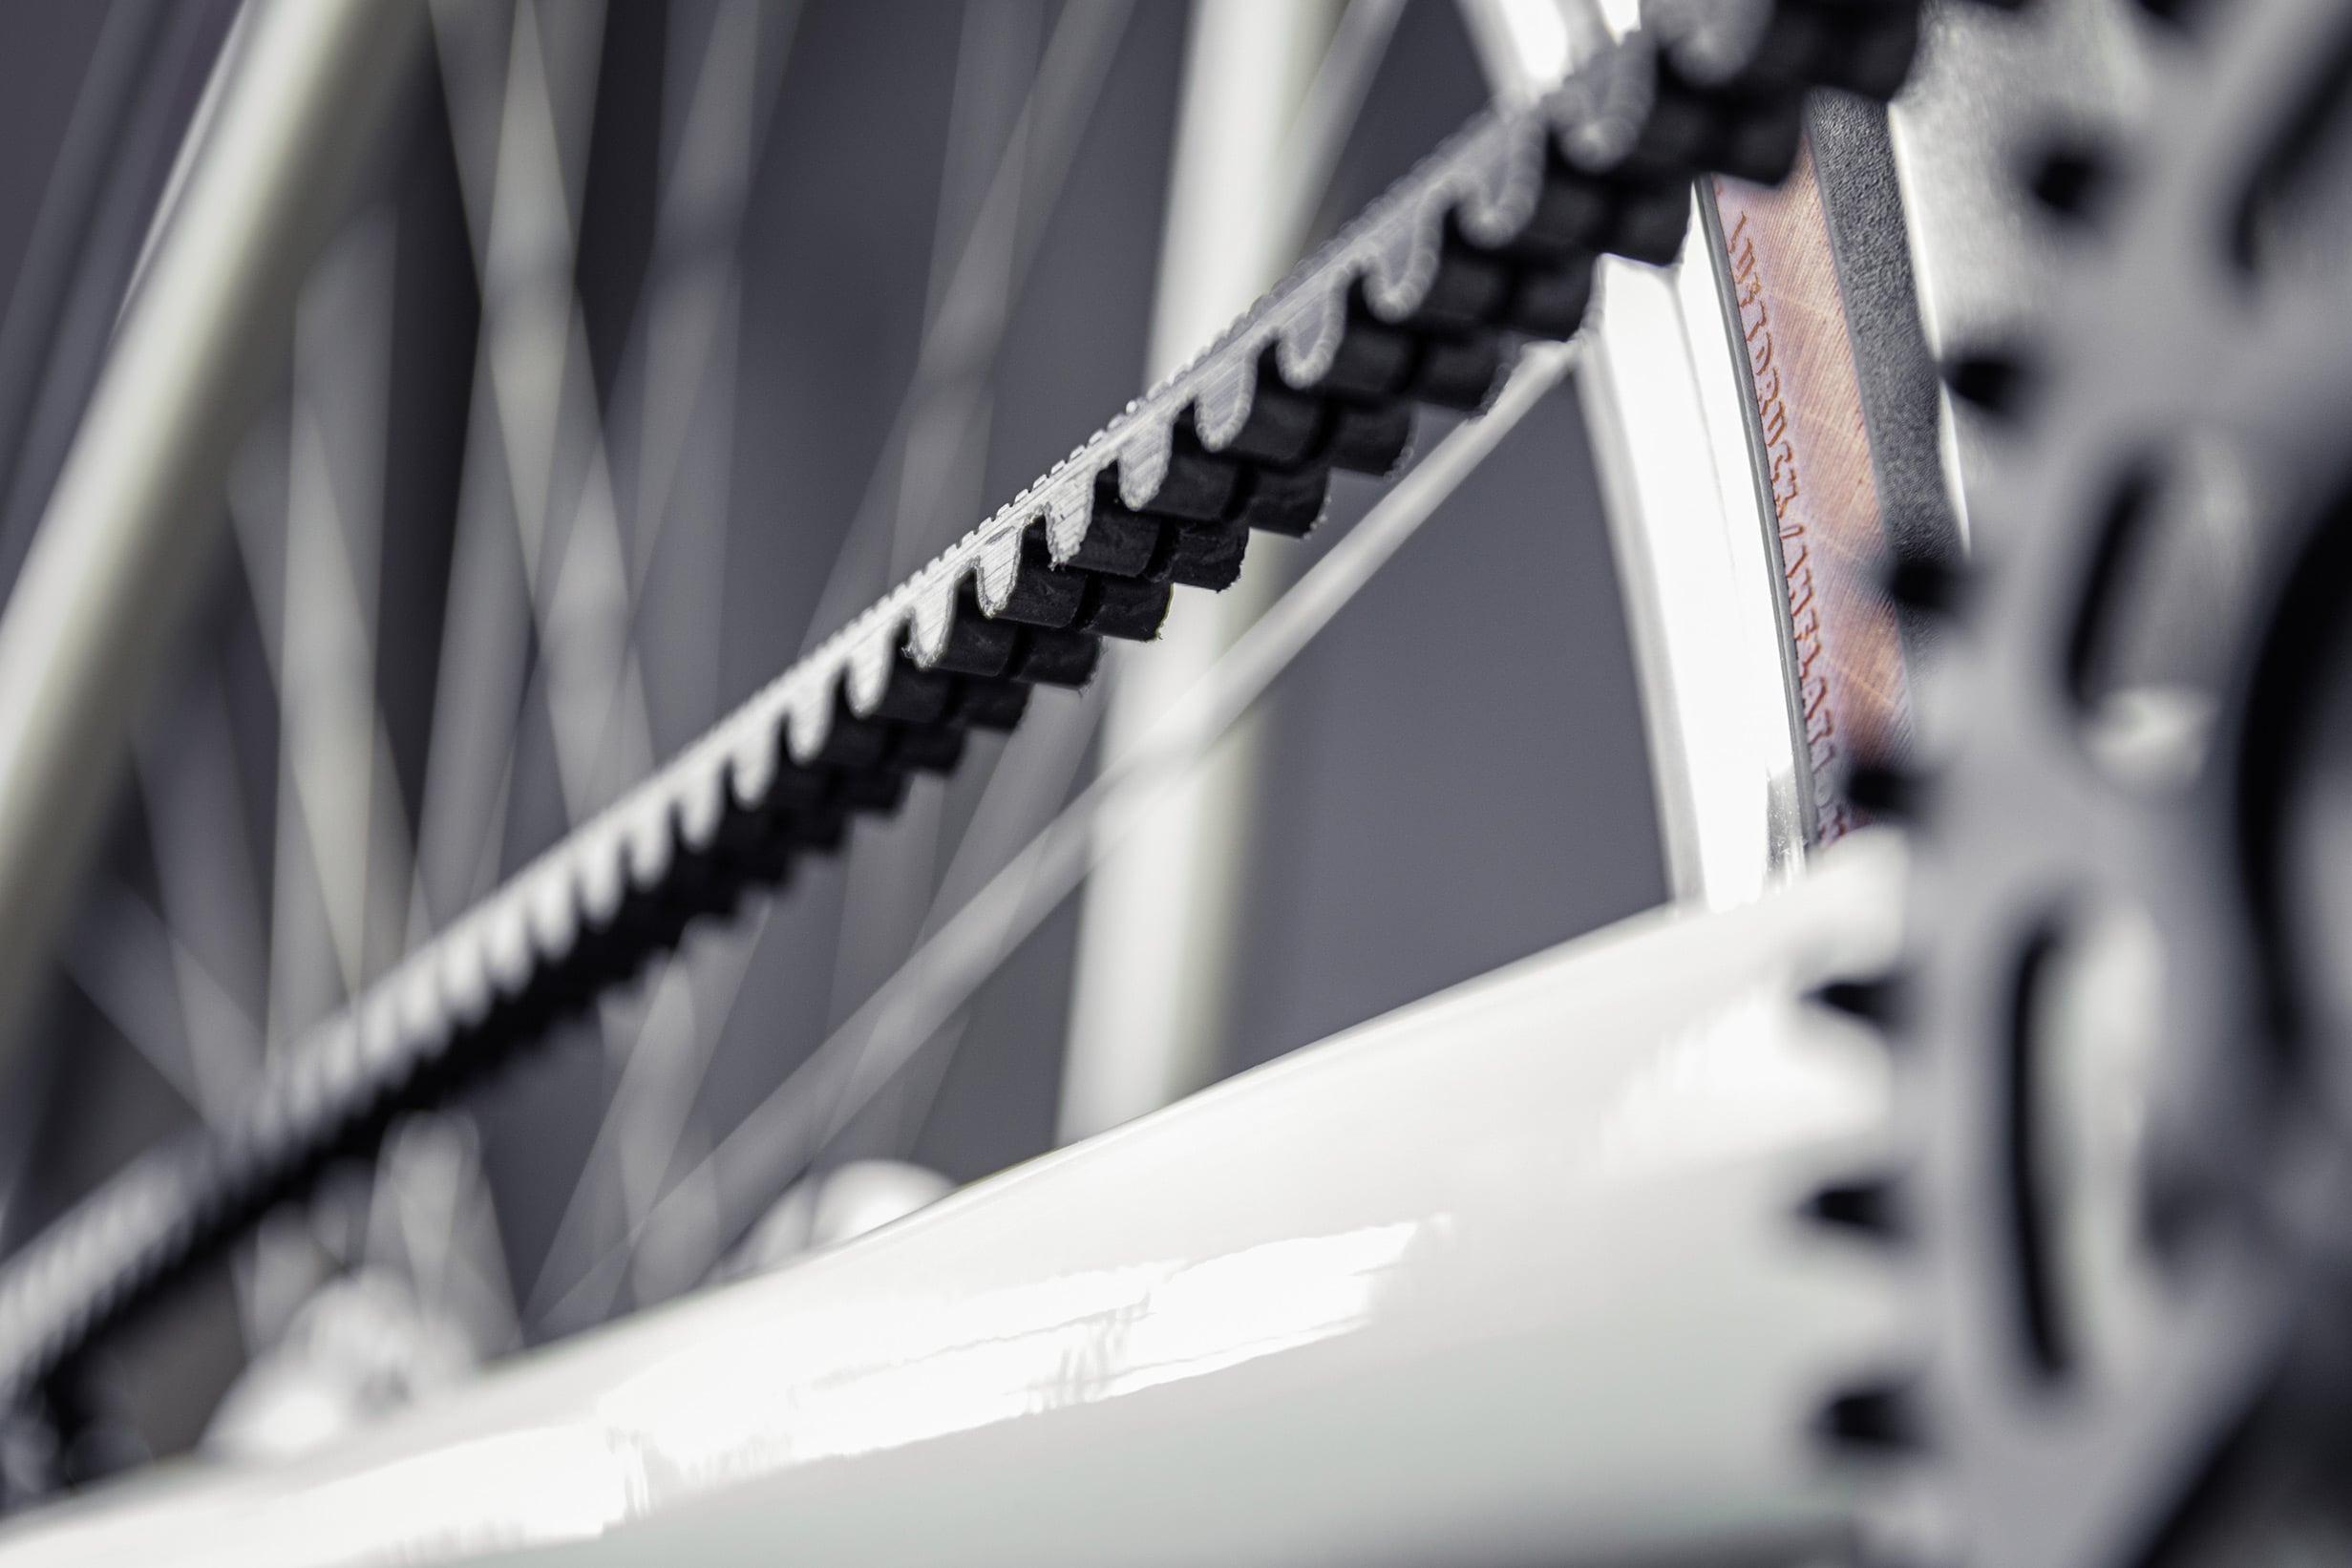 schindelhauer Antonia Pinion e-bike -21